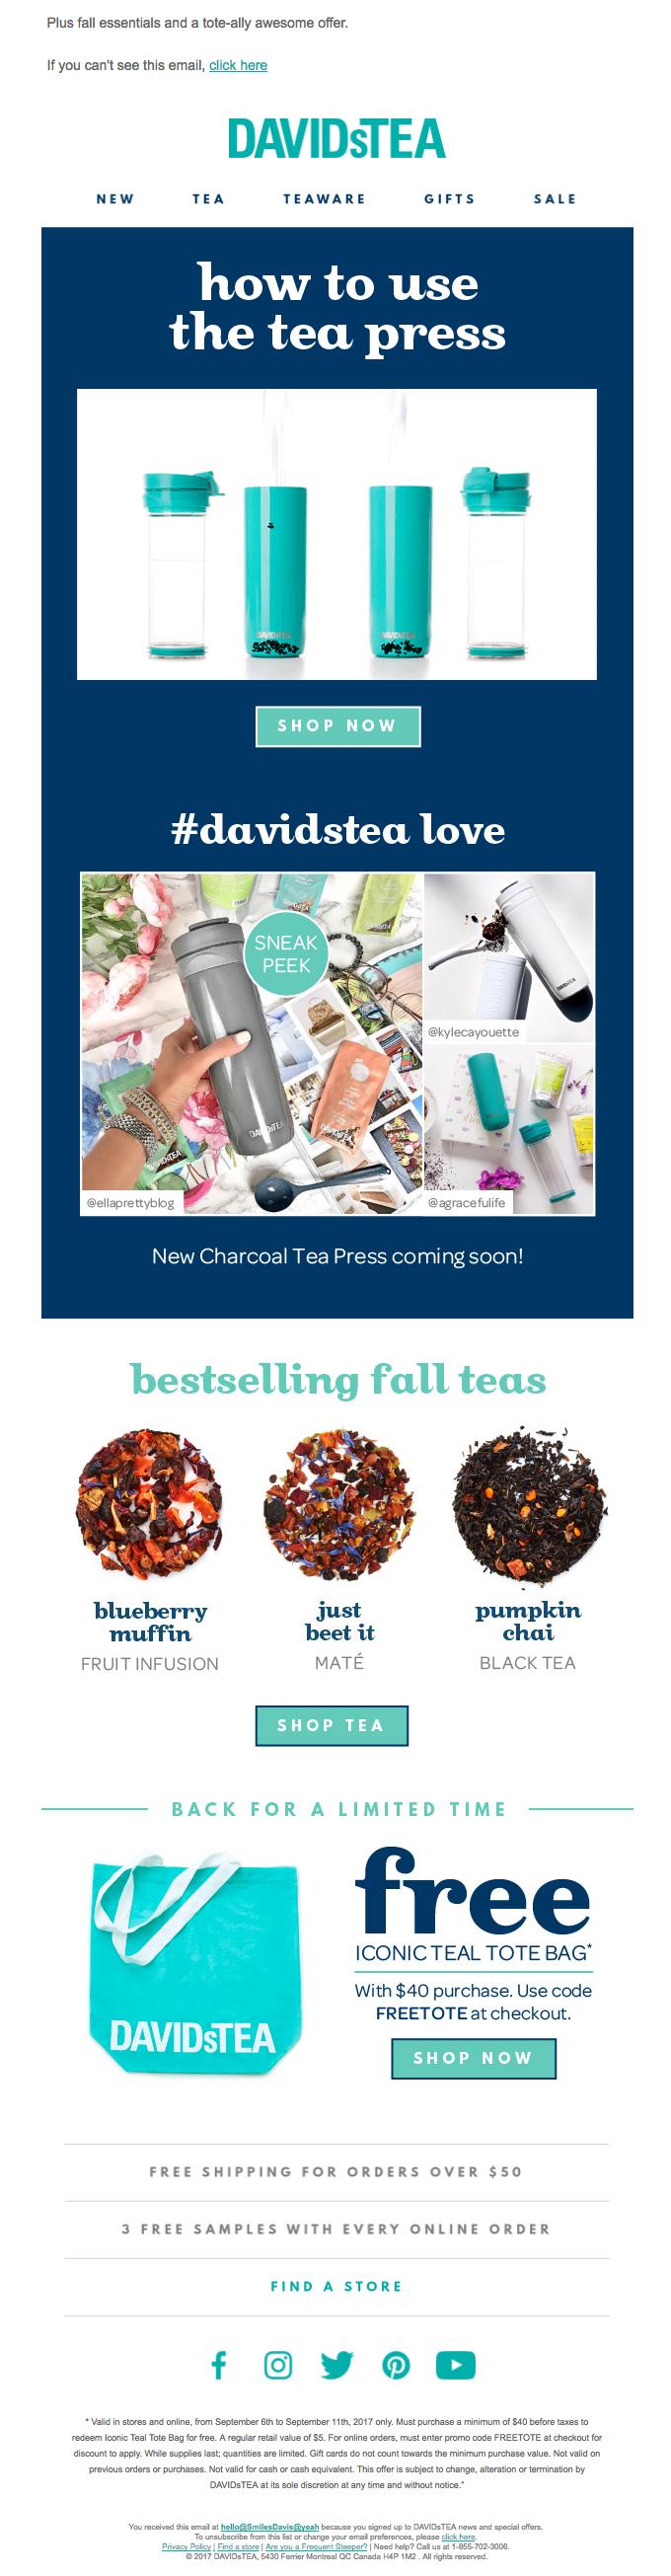 Sneak peek: New Tea Press colour inside!